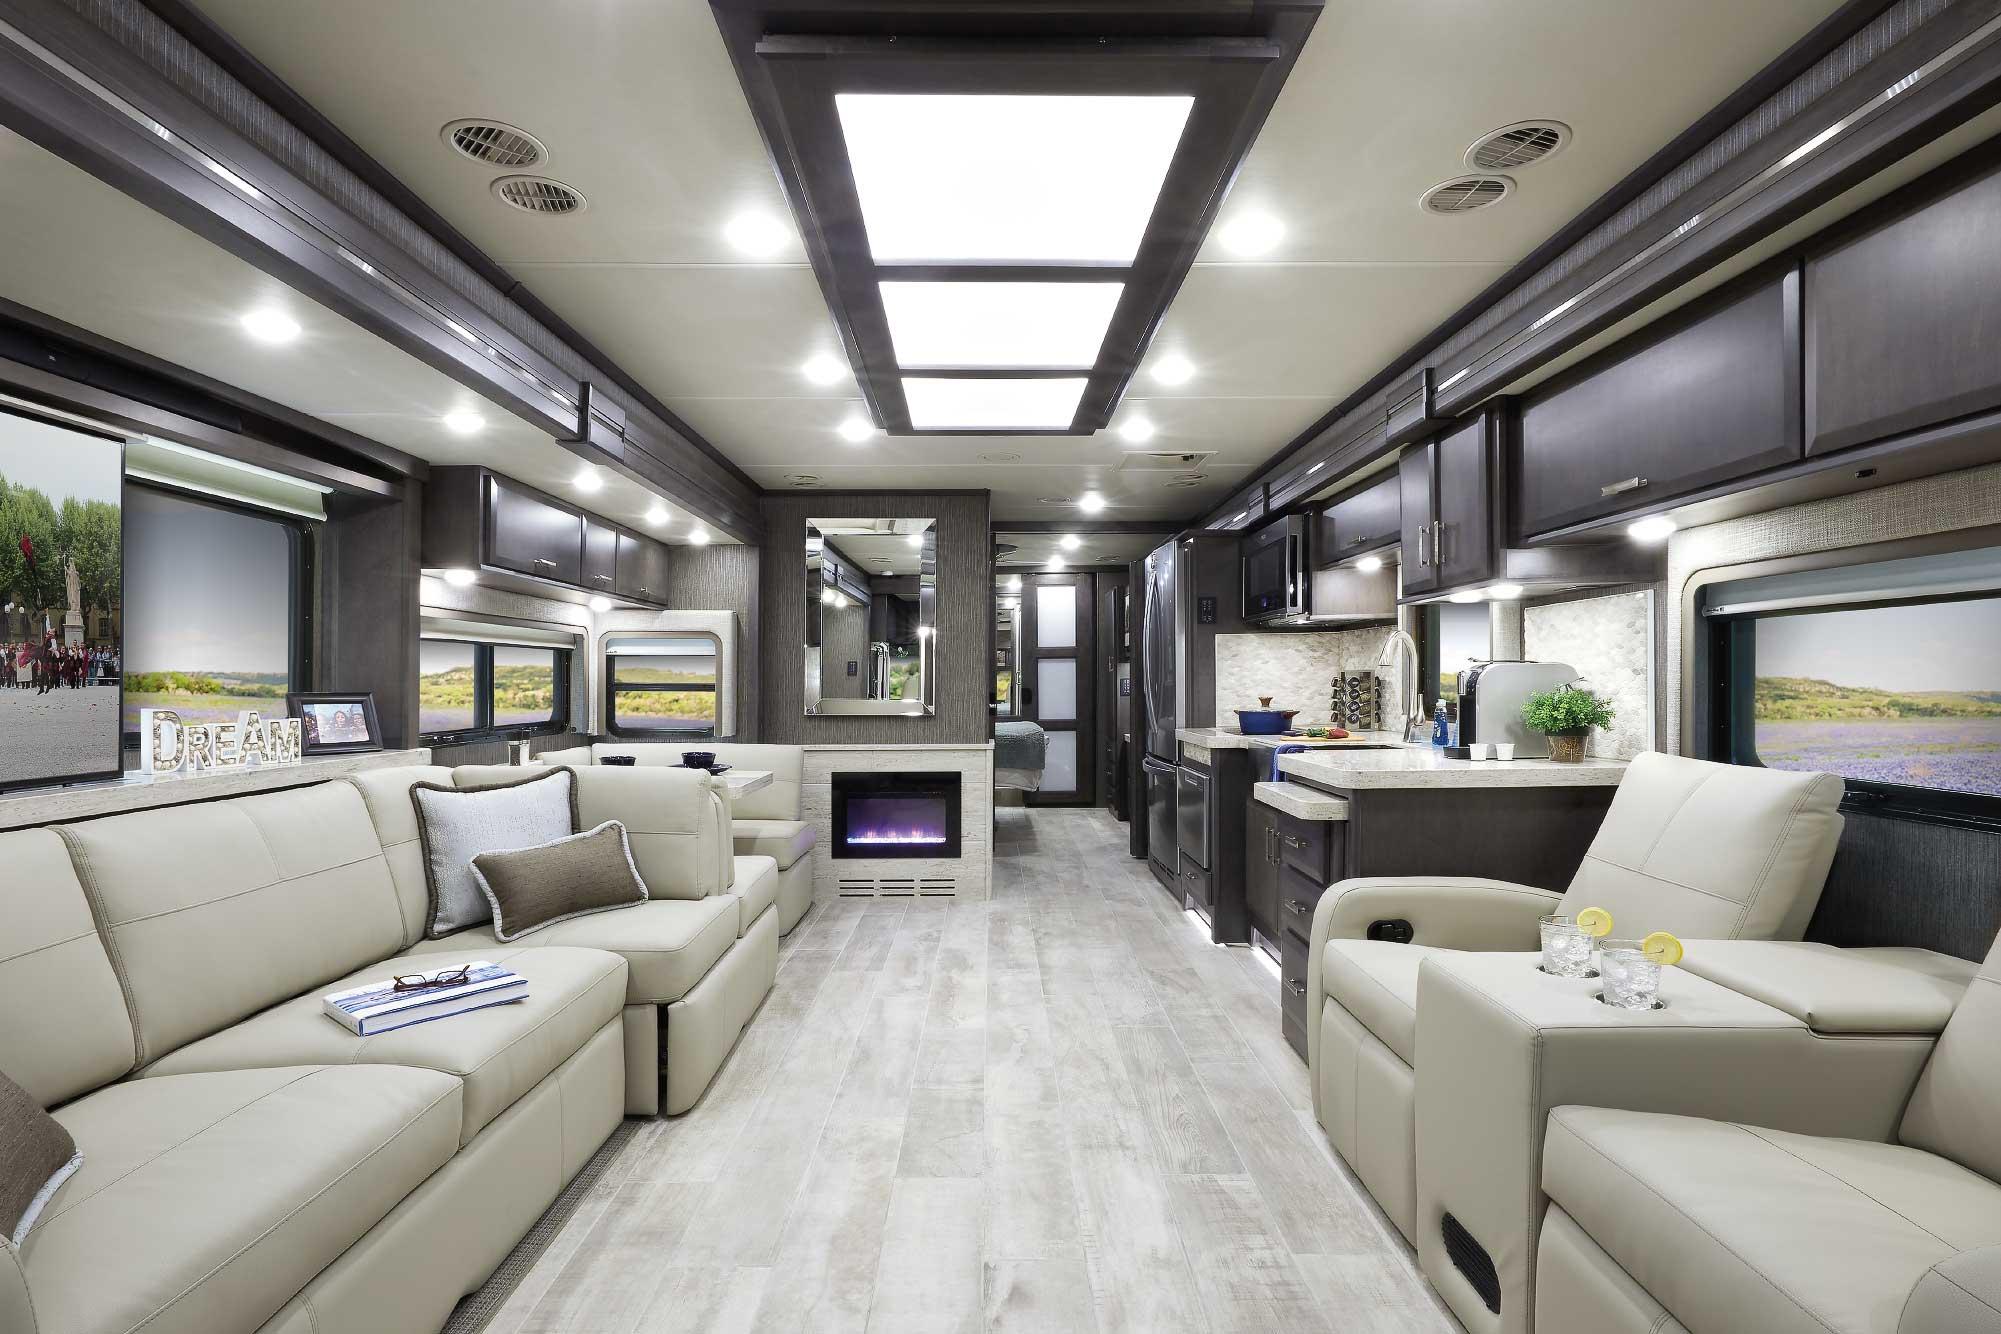 2021 Thor tuscany interior